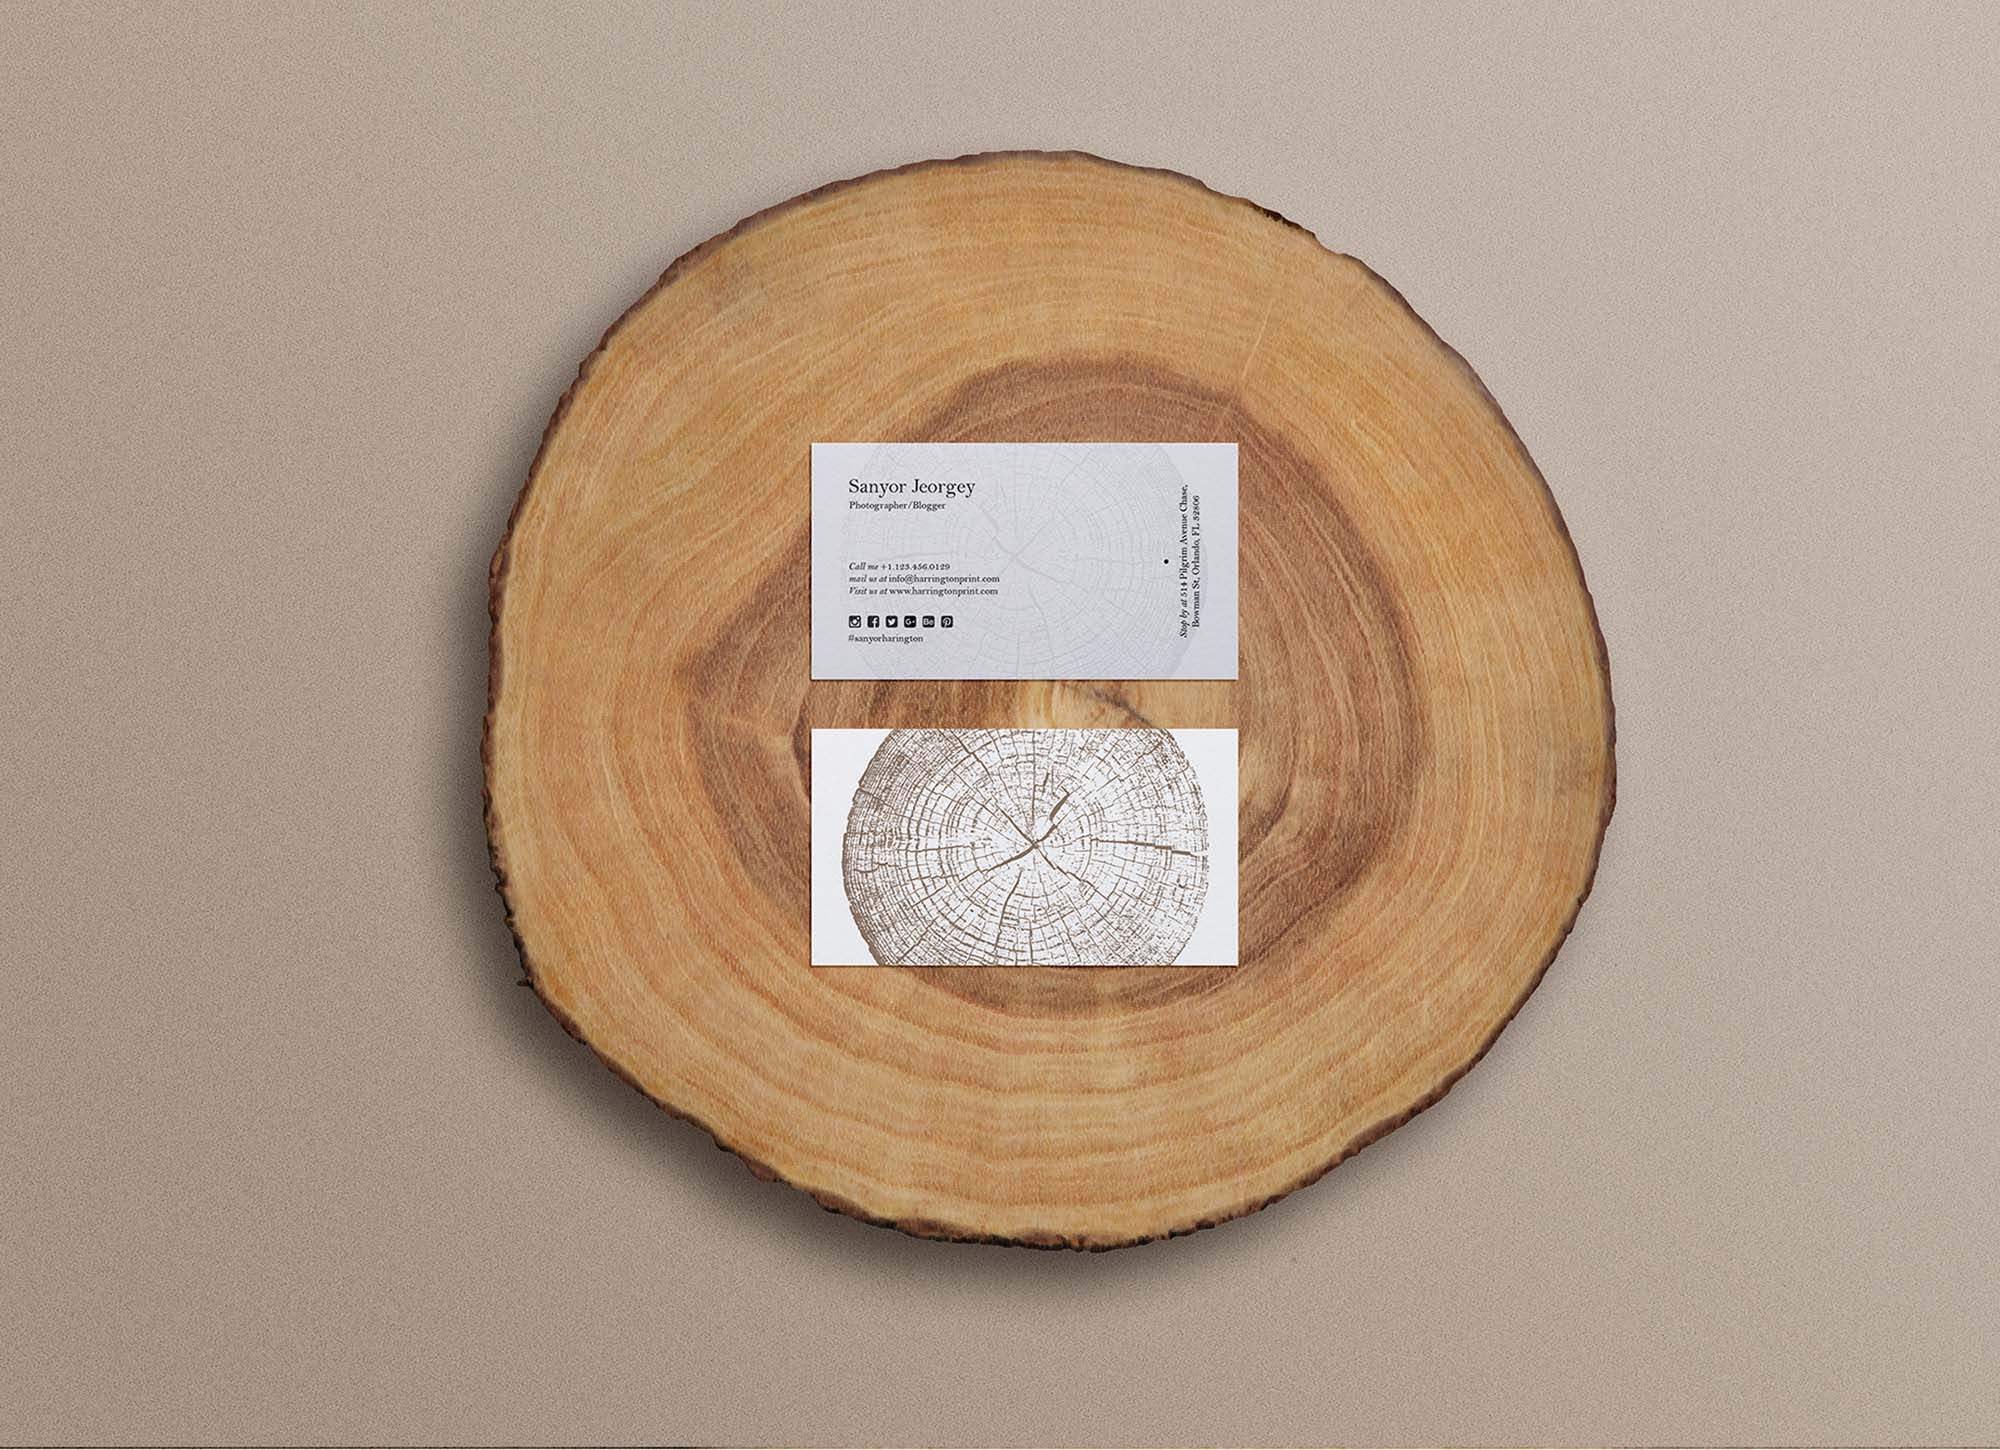 Business Card on Wood Slice Mockup